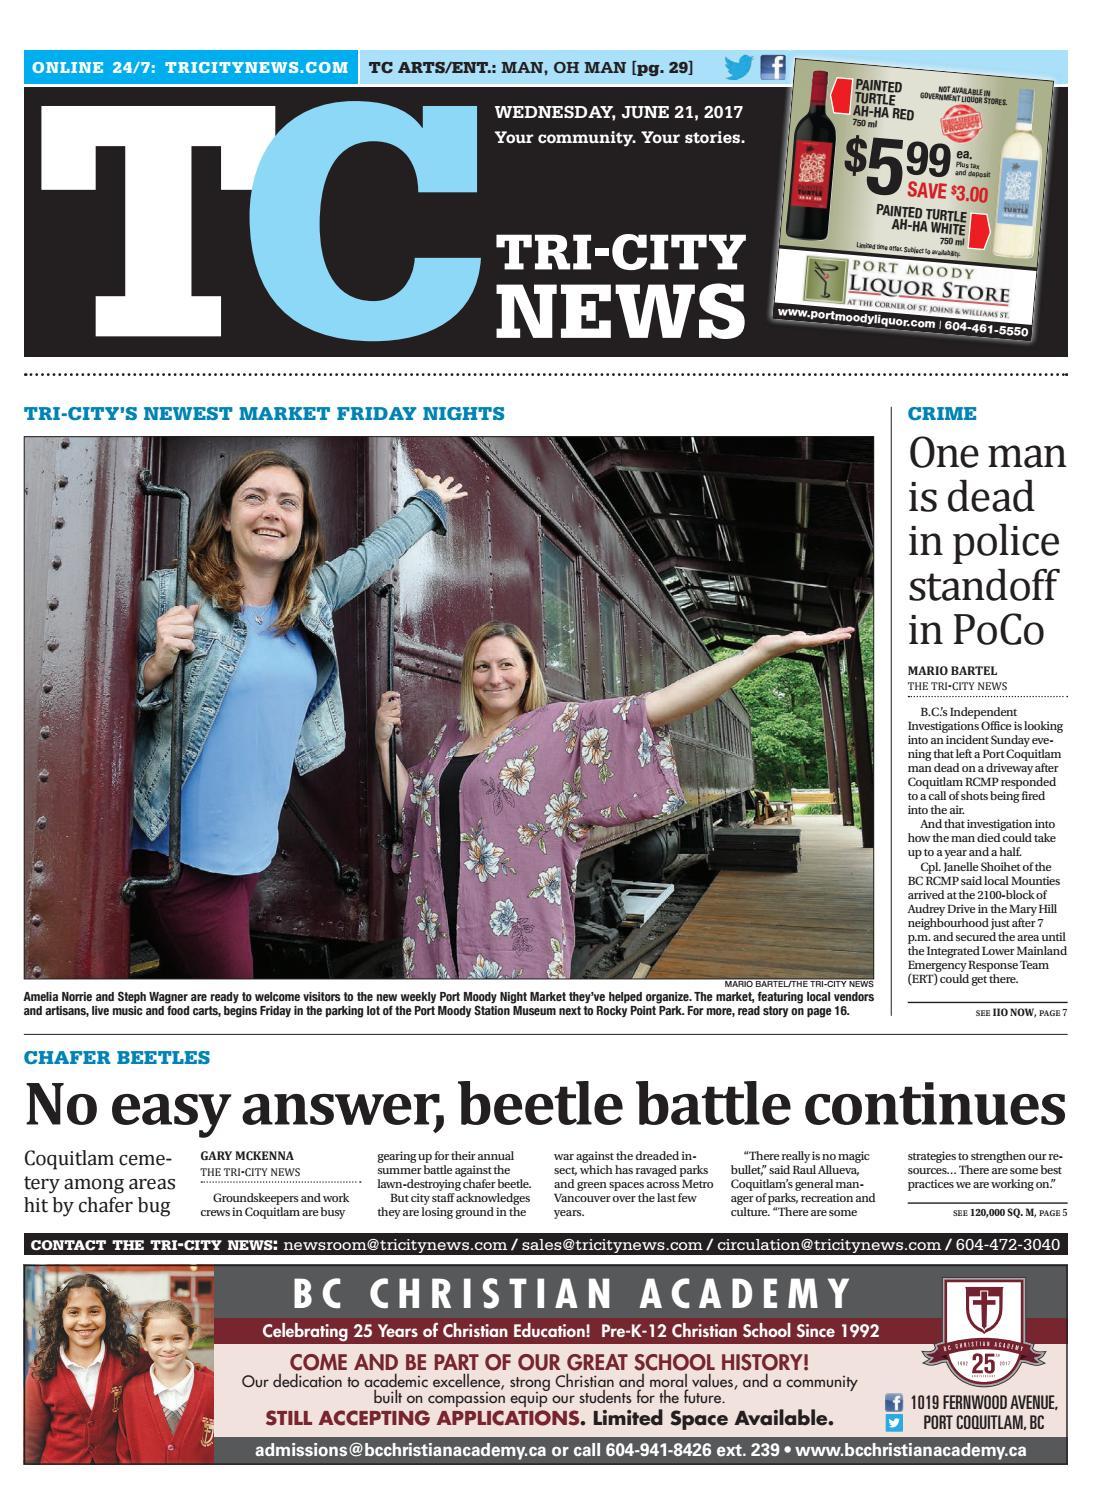 Tri-City News June 21 2017